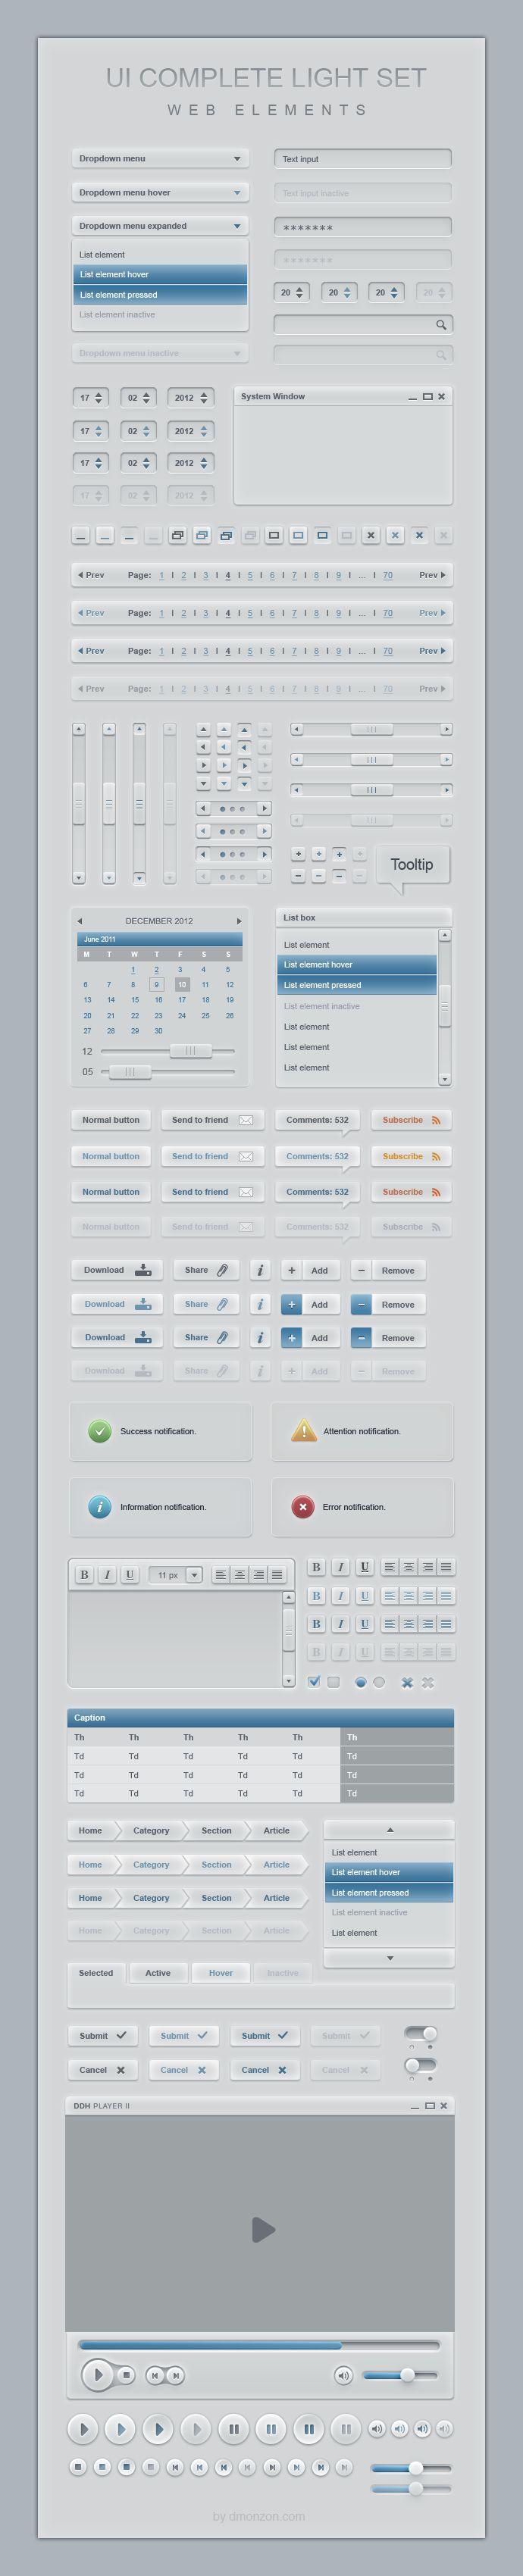 Complete Web User Interface Light Elements Set